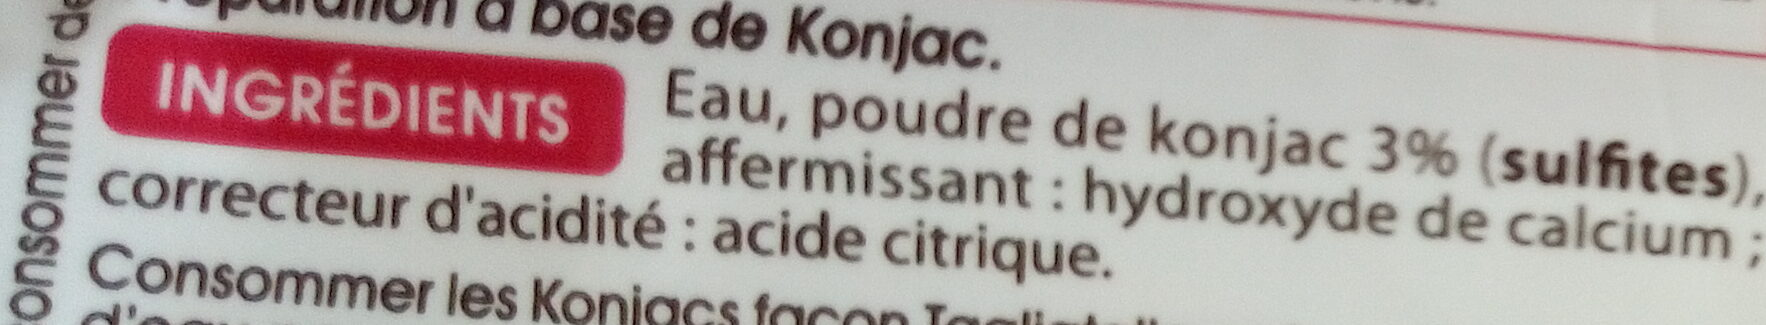 Tagliatelle de Konjac - Ingrédients - fr